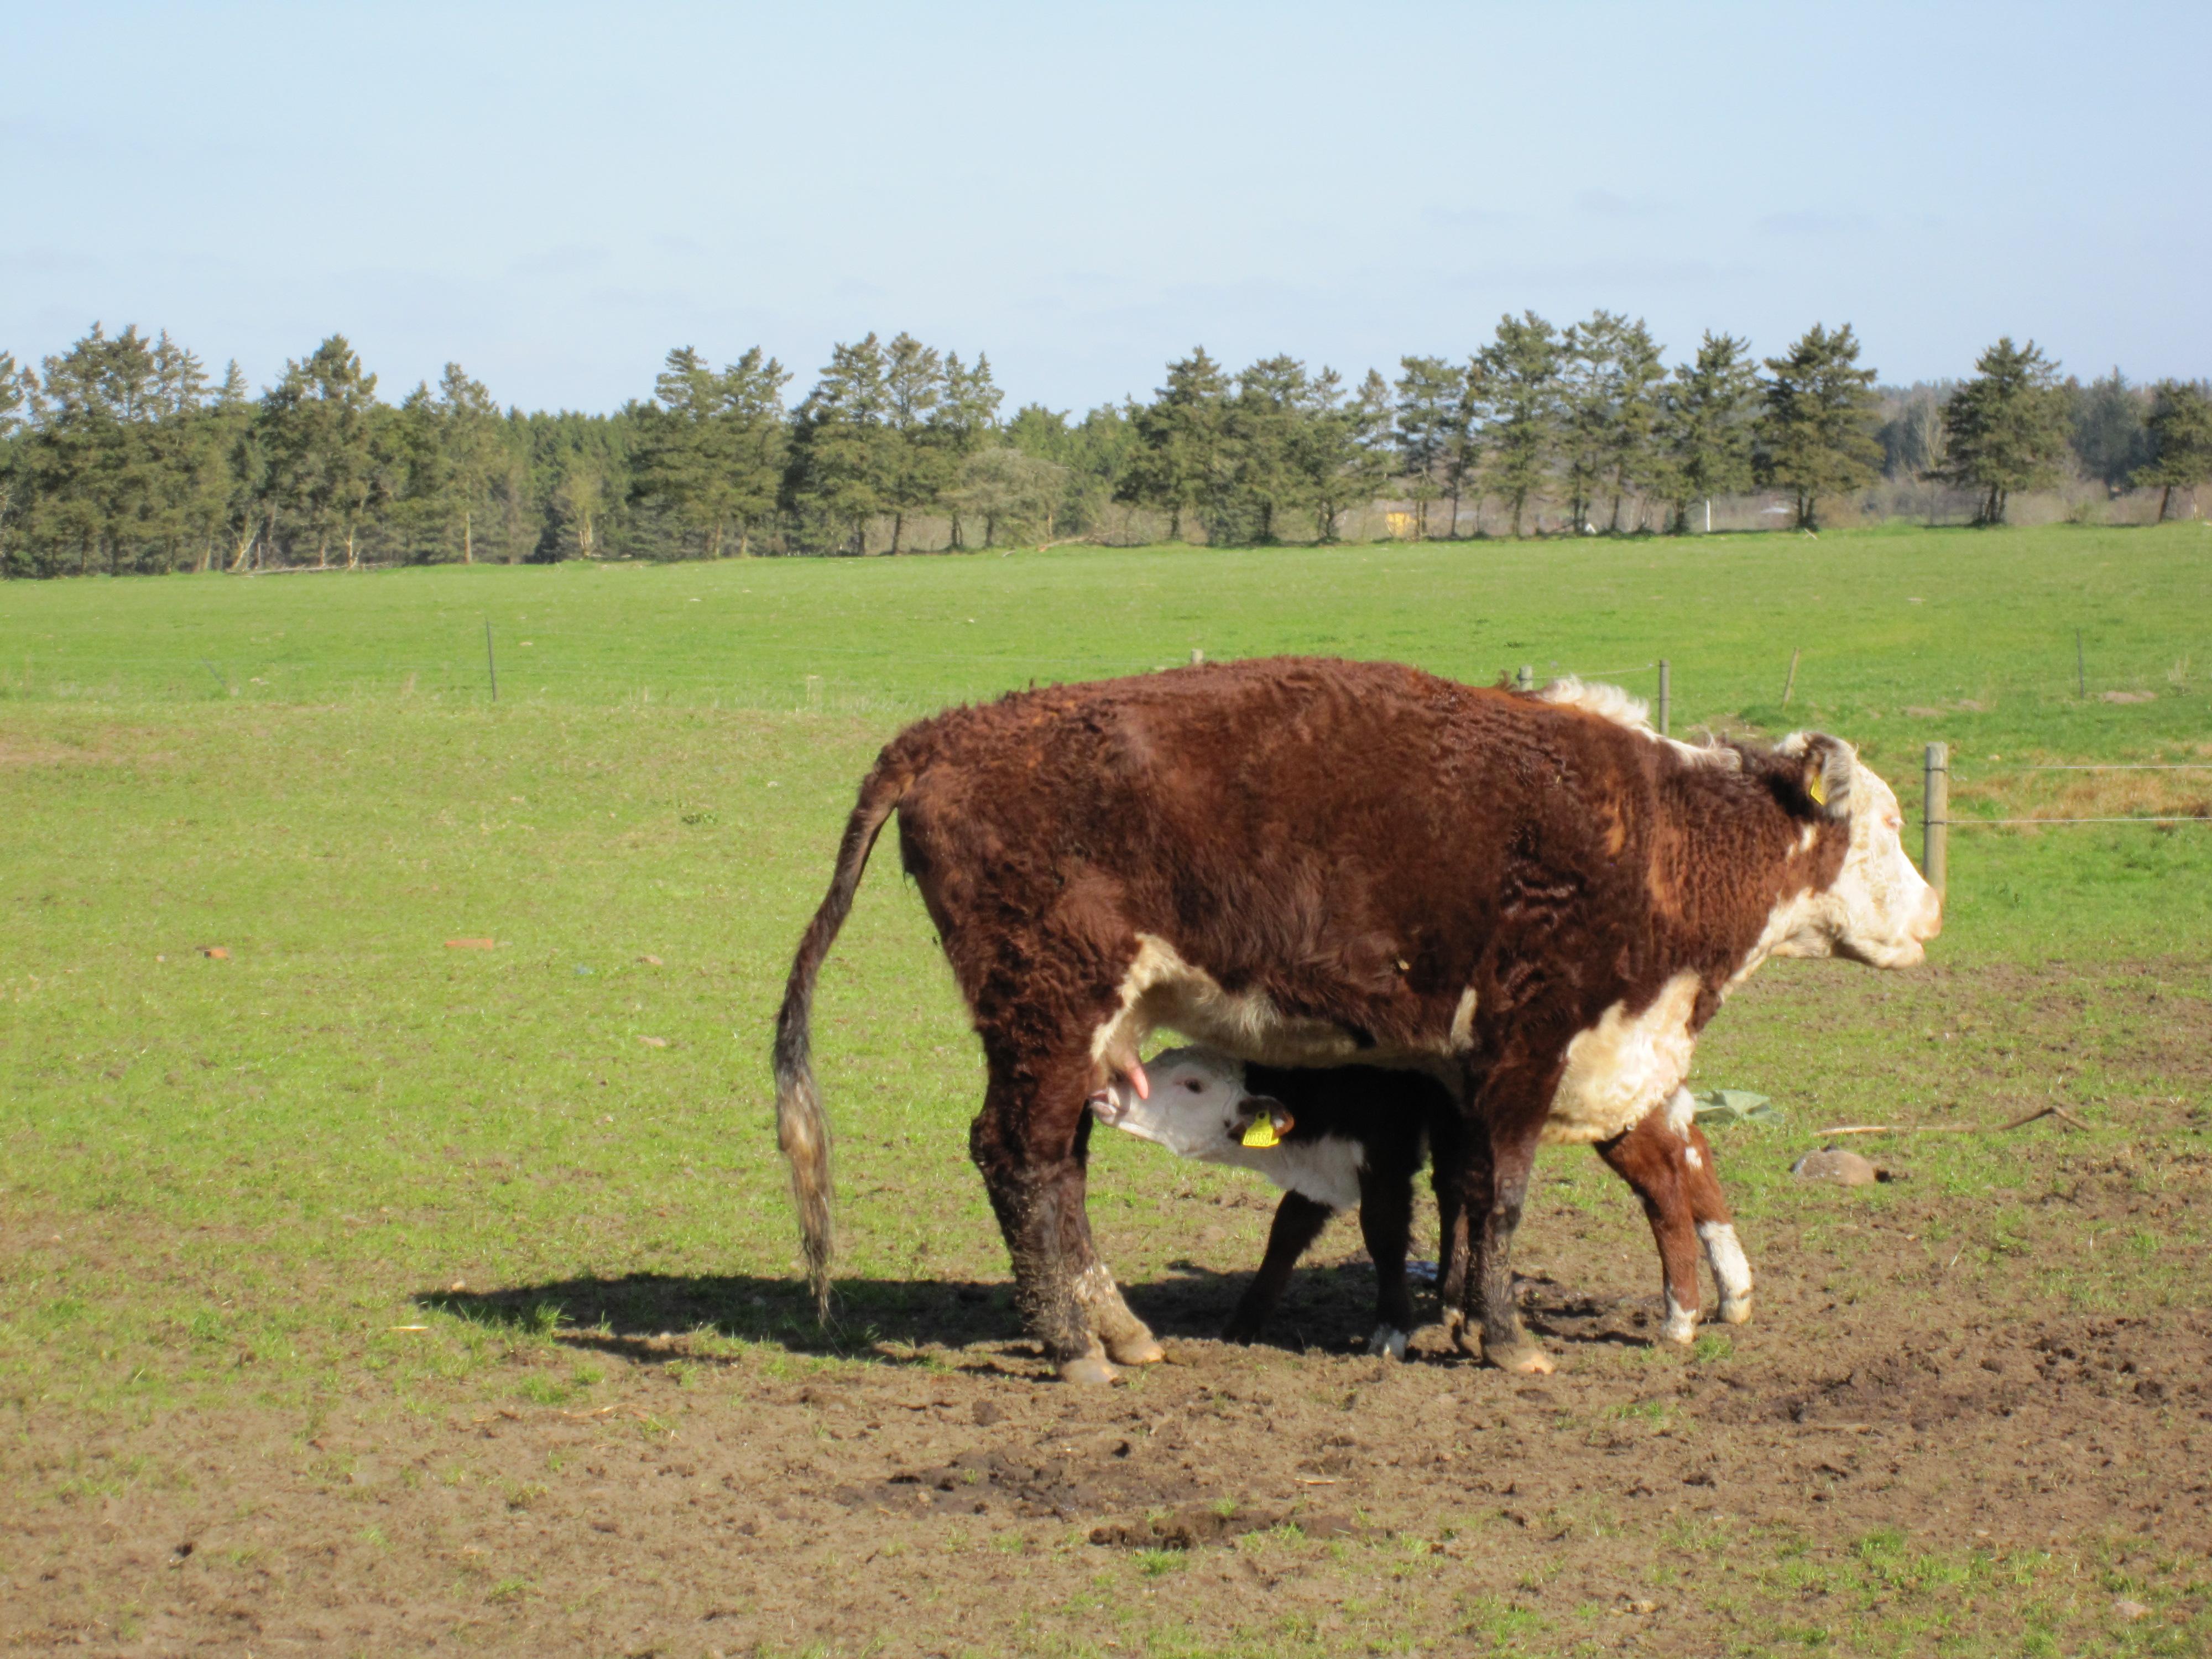 Nyfødt kalv får sin første tår mælk